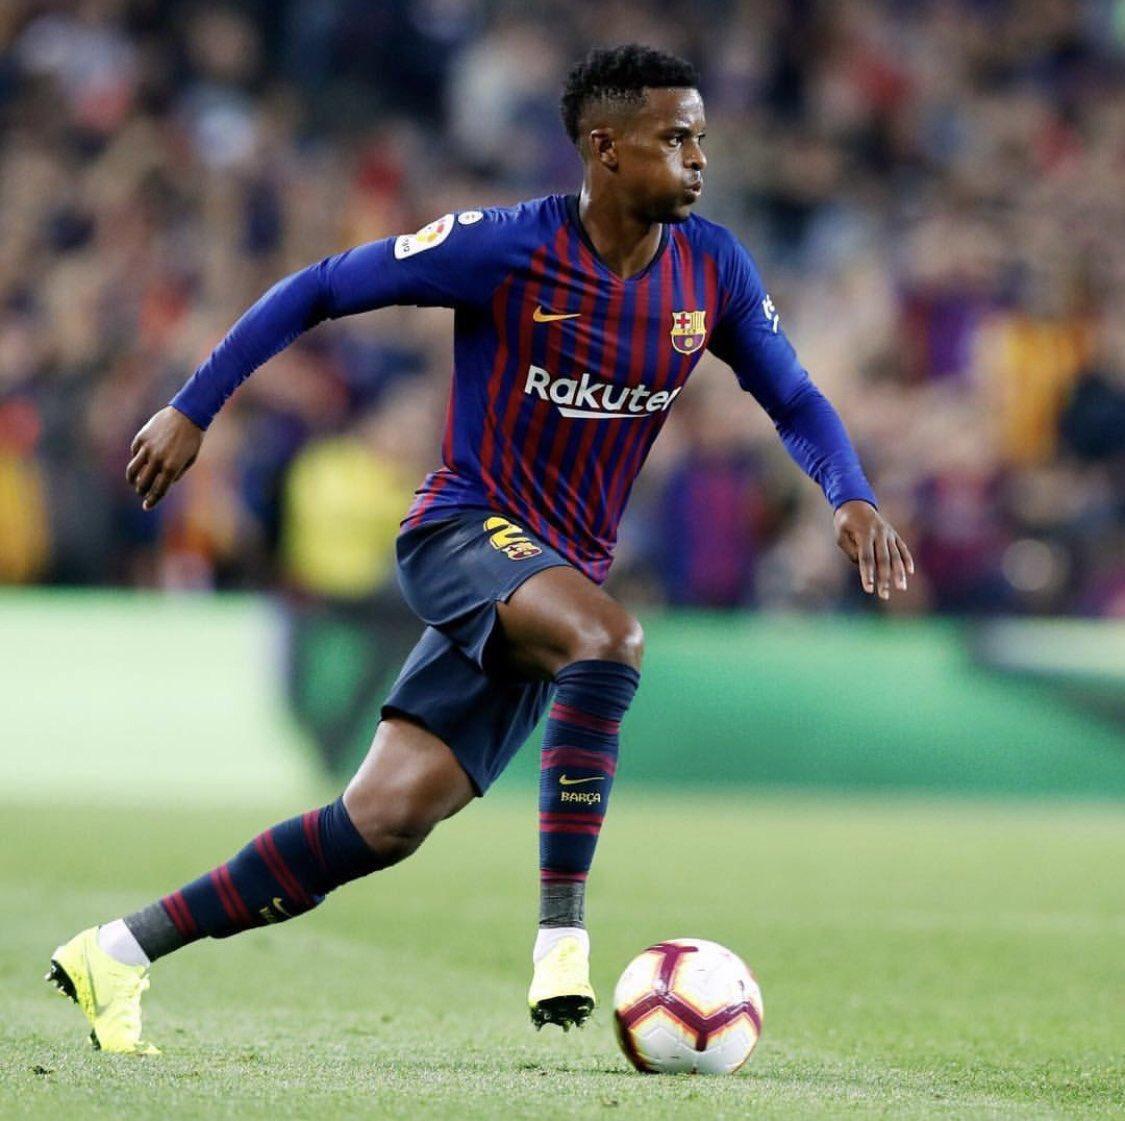 PSV - Barça : le onze probable du Barça